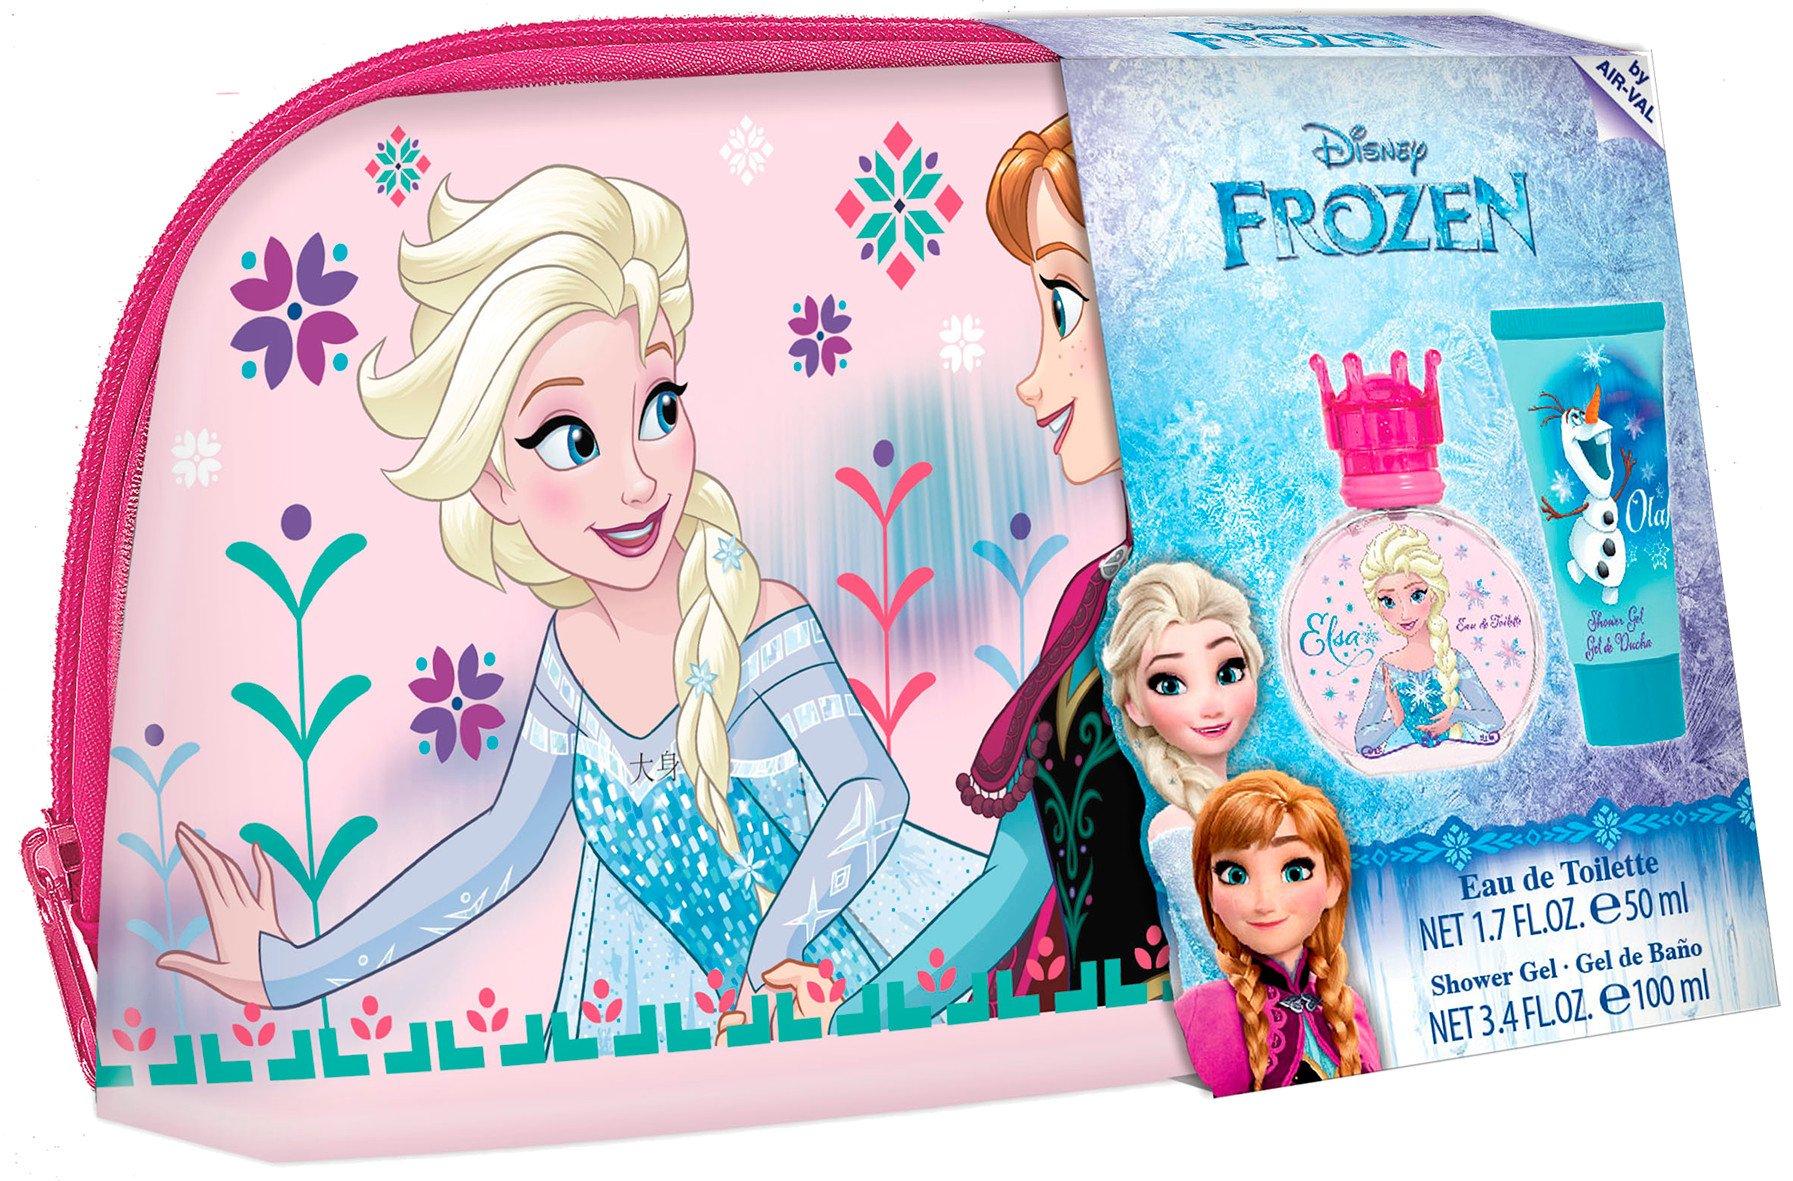 Disney Frozen for Kids 3 Piece Gift Set by Disney (Image #2)